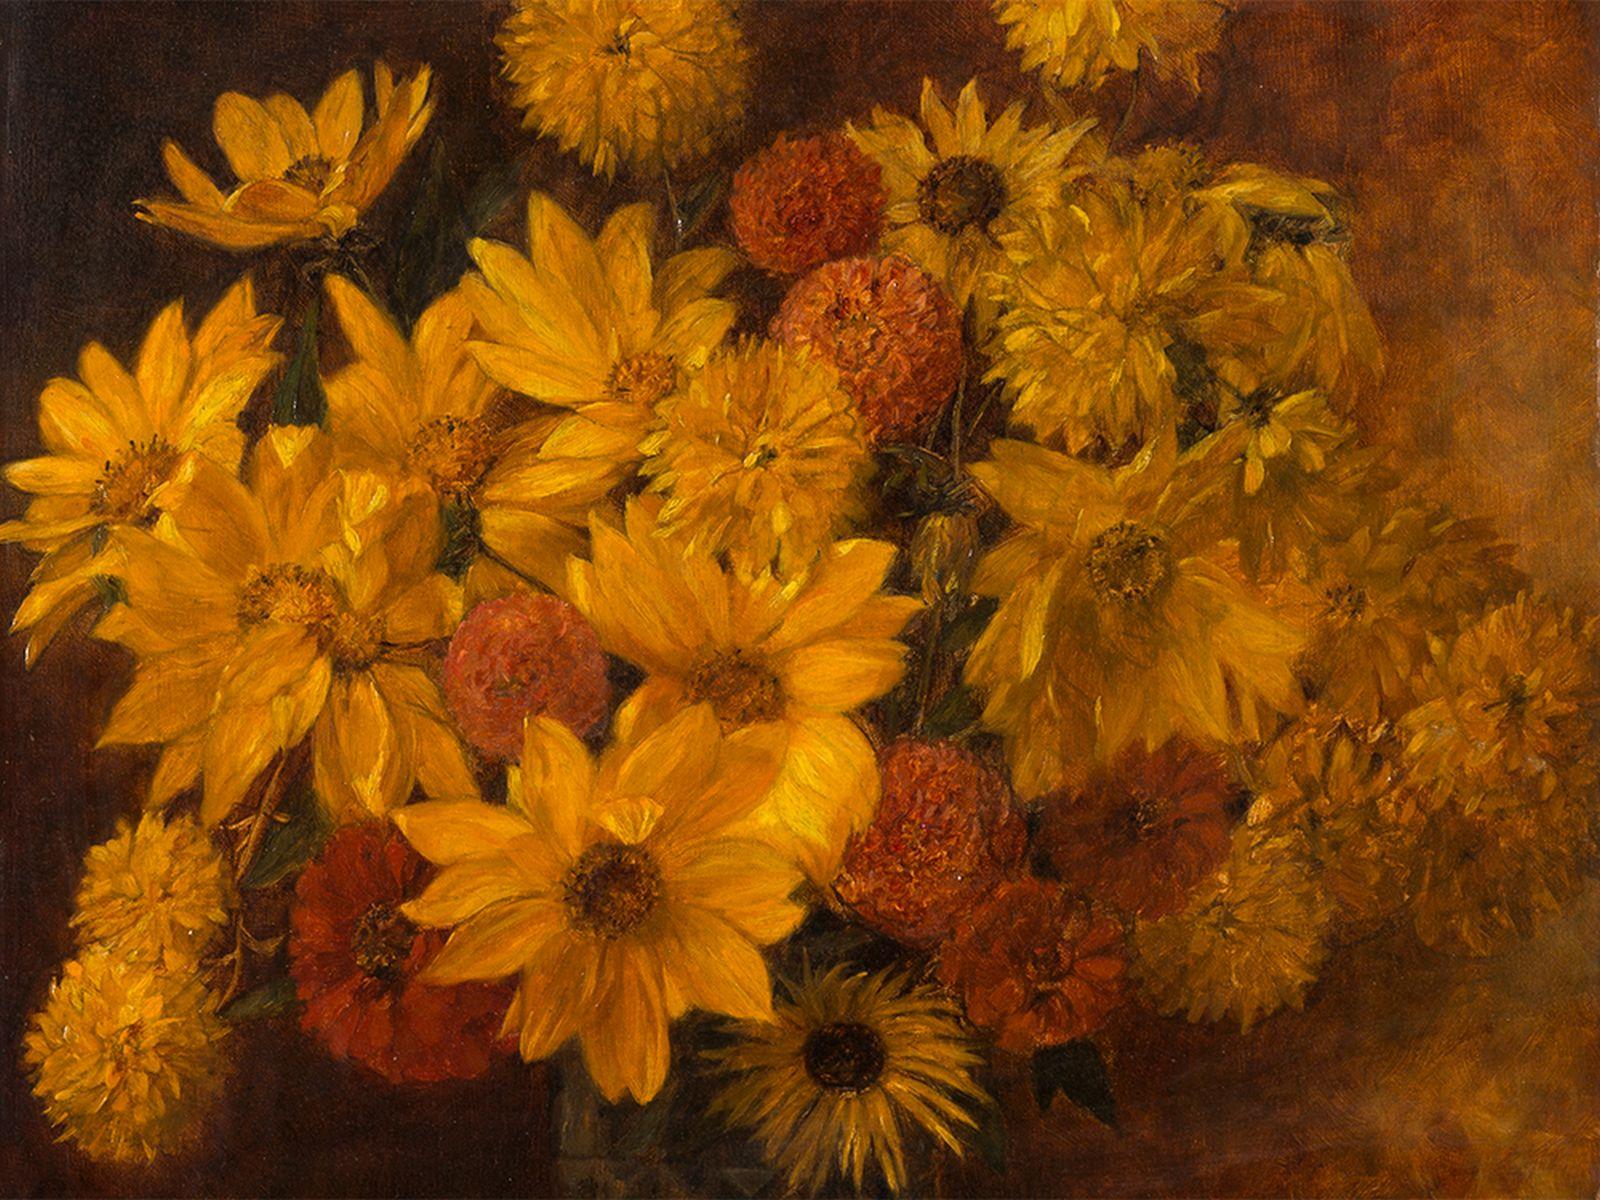 Vente Paintings & Furniture / Gemälde und Möbel - Teil II chez Amadeus Auction : 176 lots